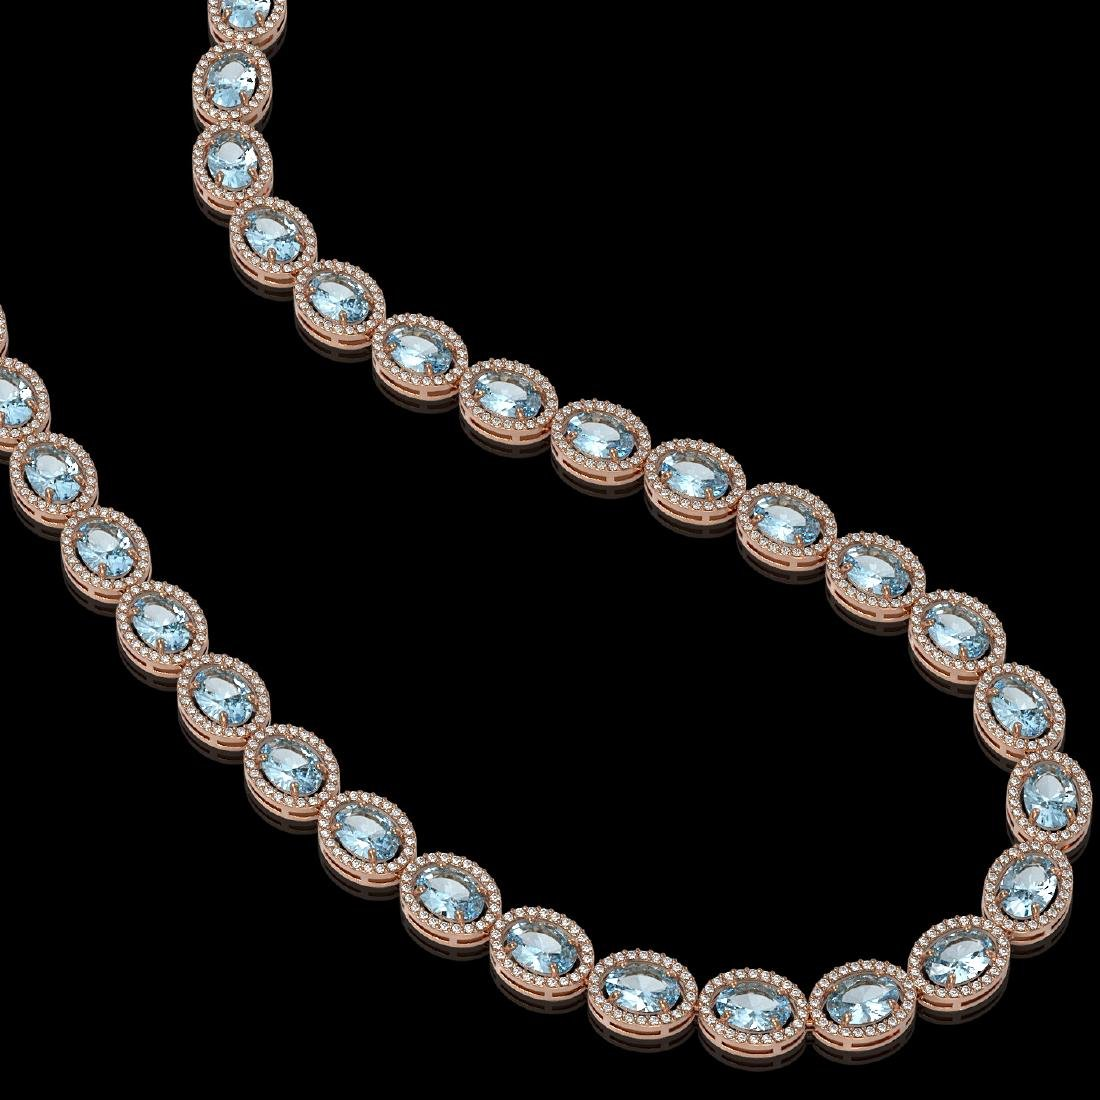 41.88 CTW Aquamarine & Diamond Halo Necklace 10K Rose